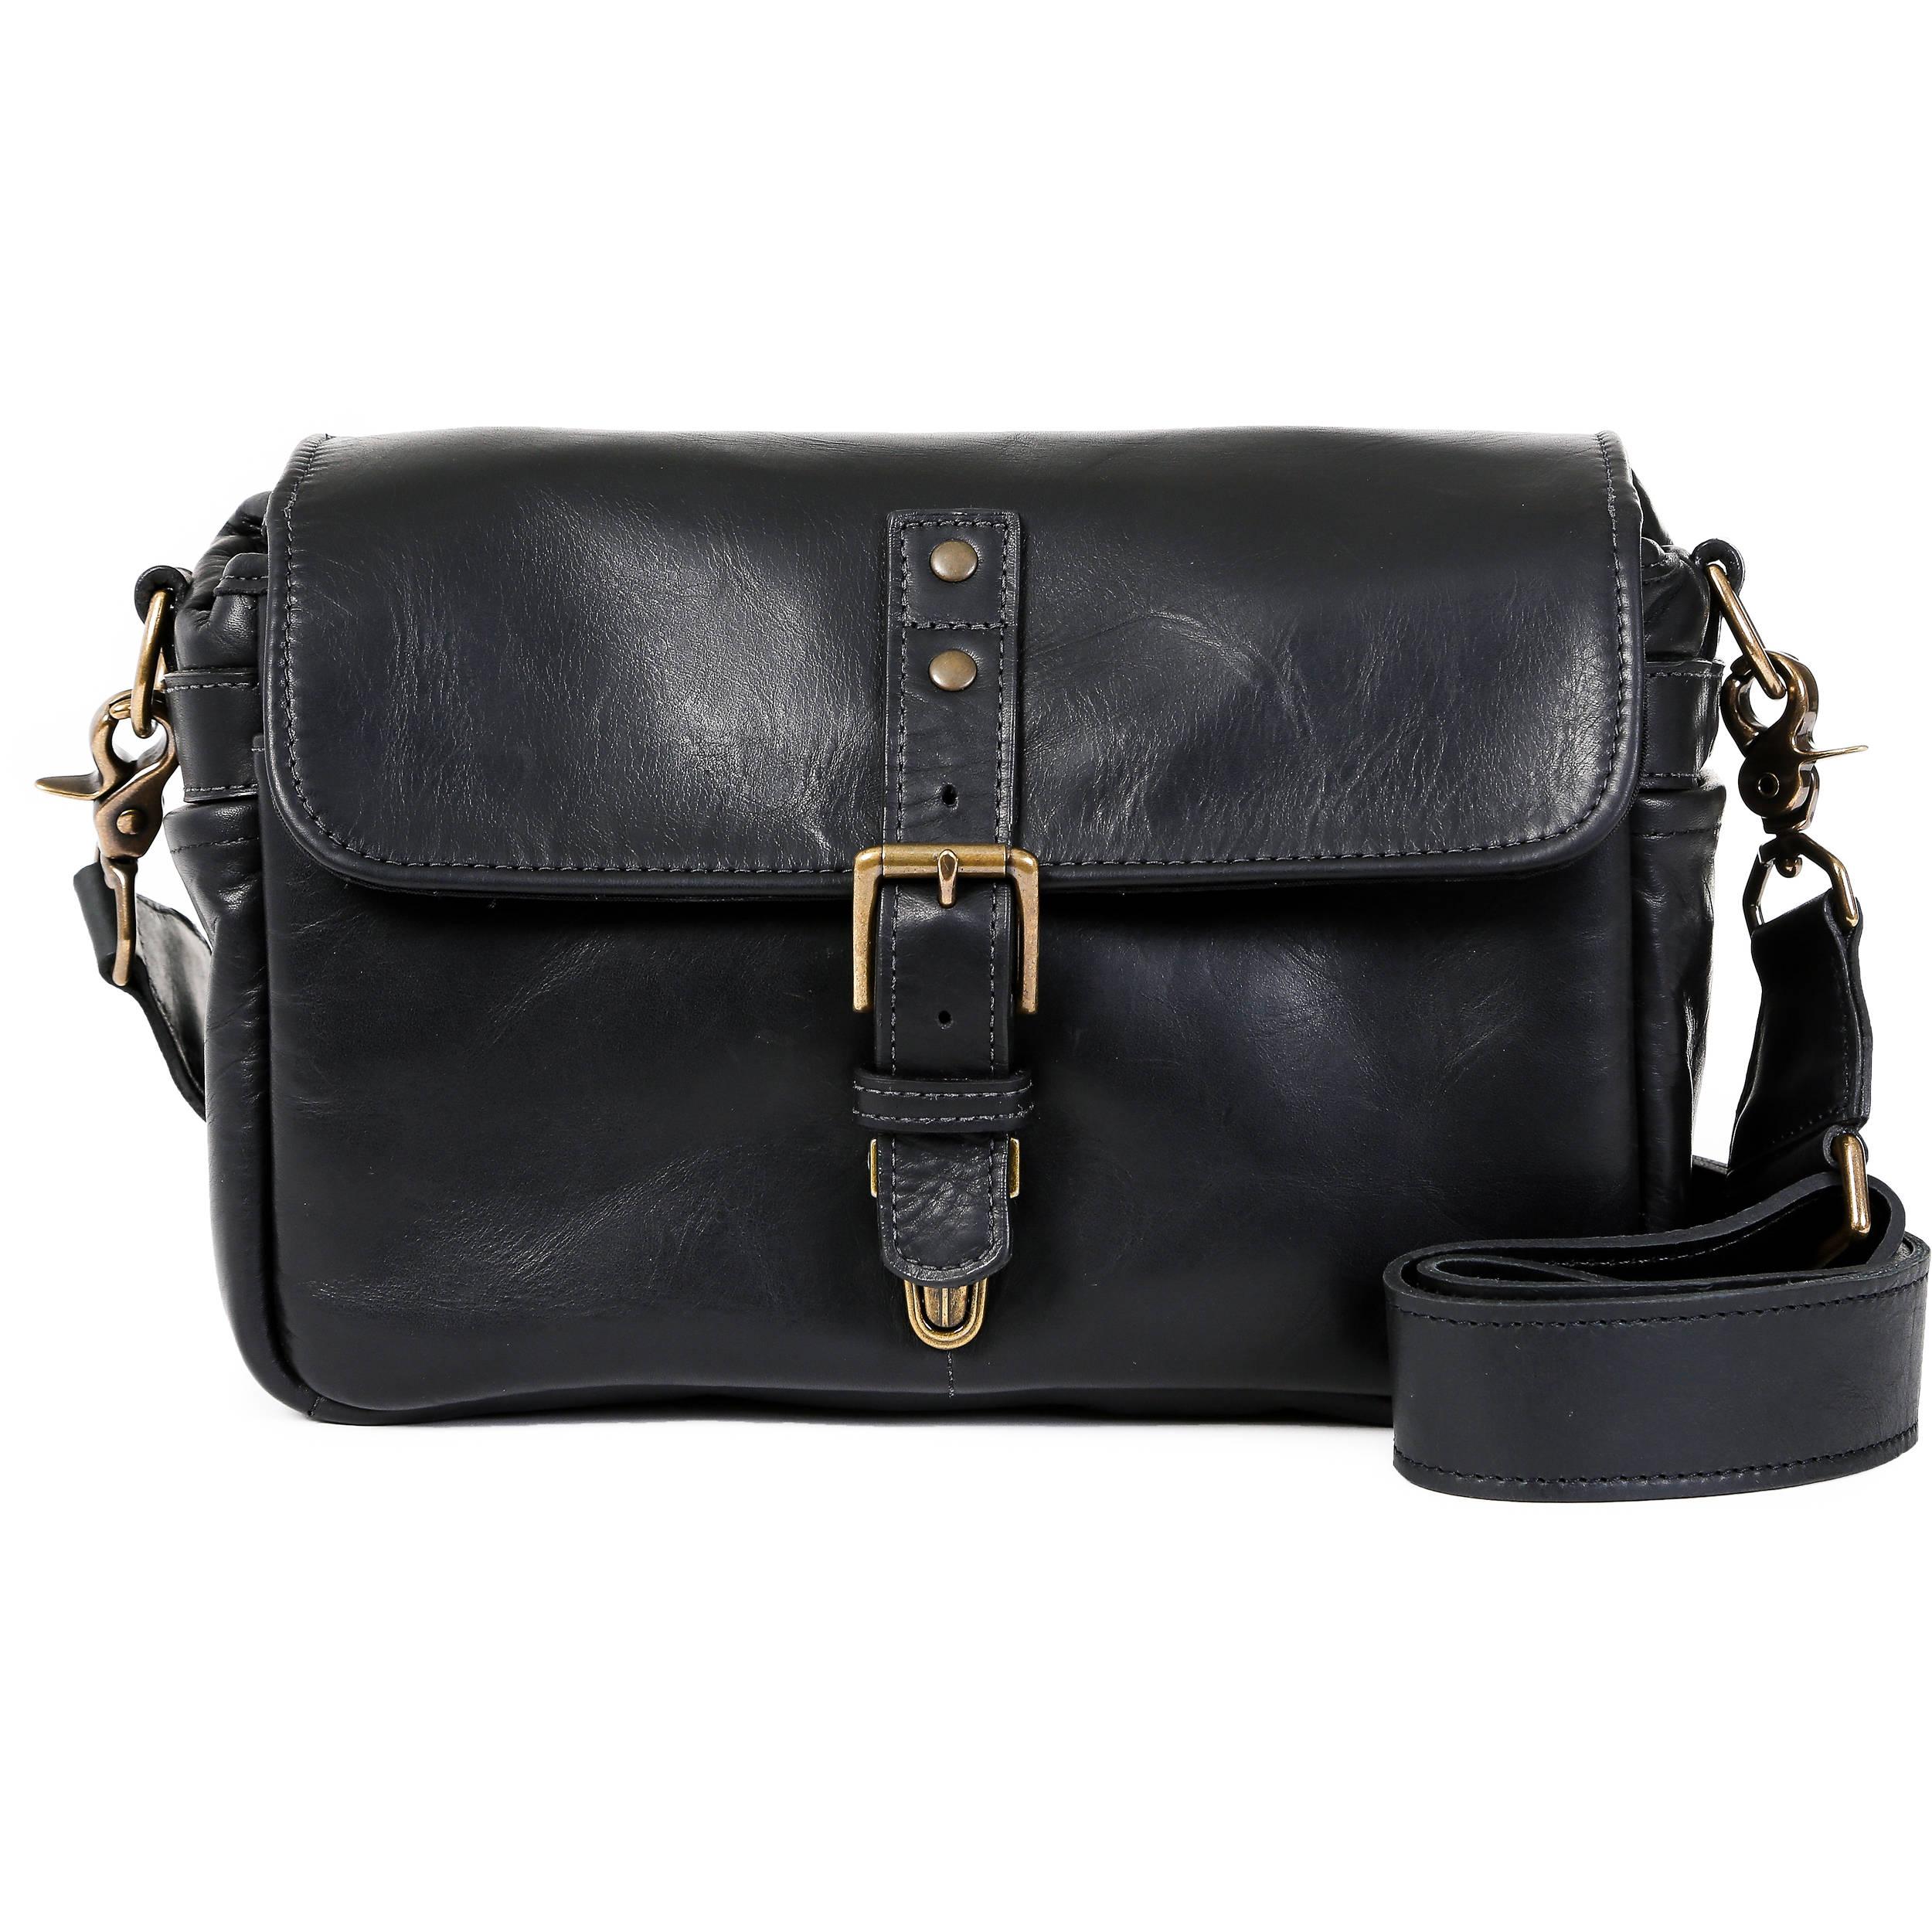 Ona Bowery Camera Bag Leather Black Ona5 014lbl Bh Photo Latched Relay Engineering Expert Witness Blog